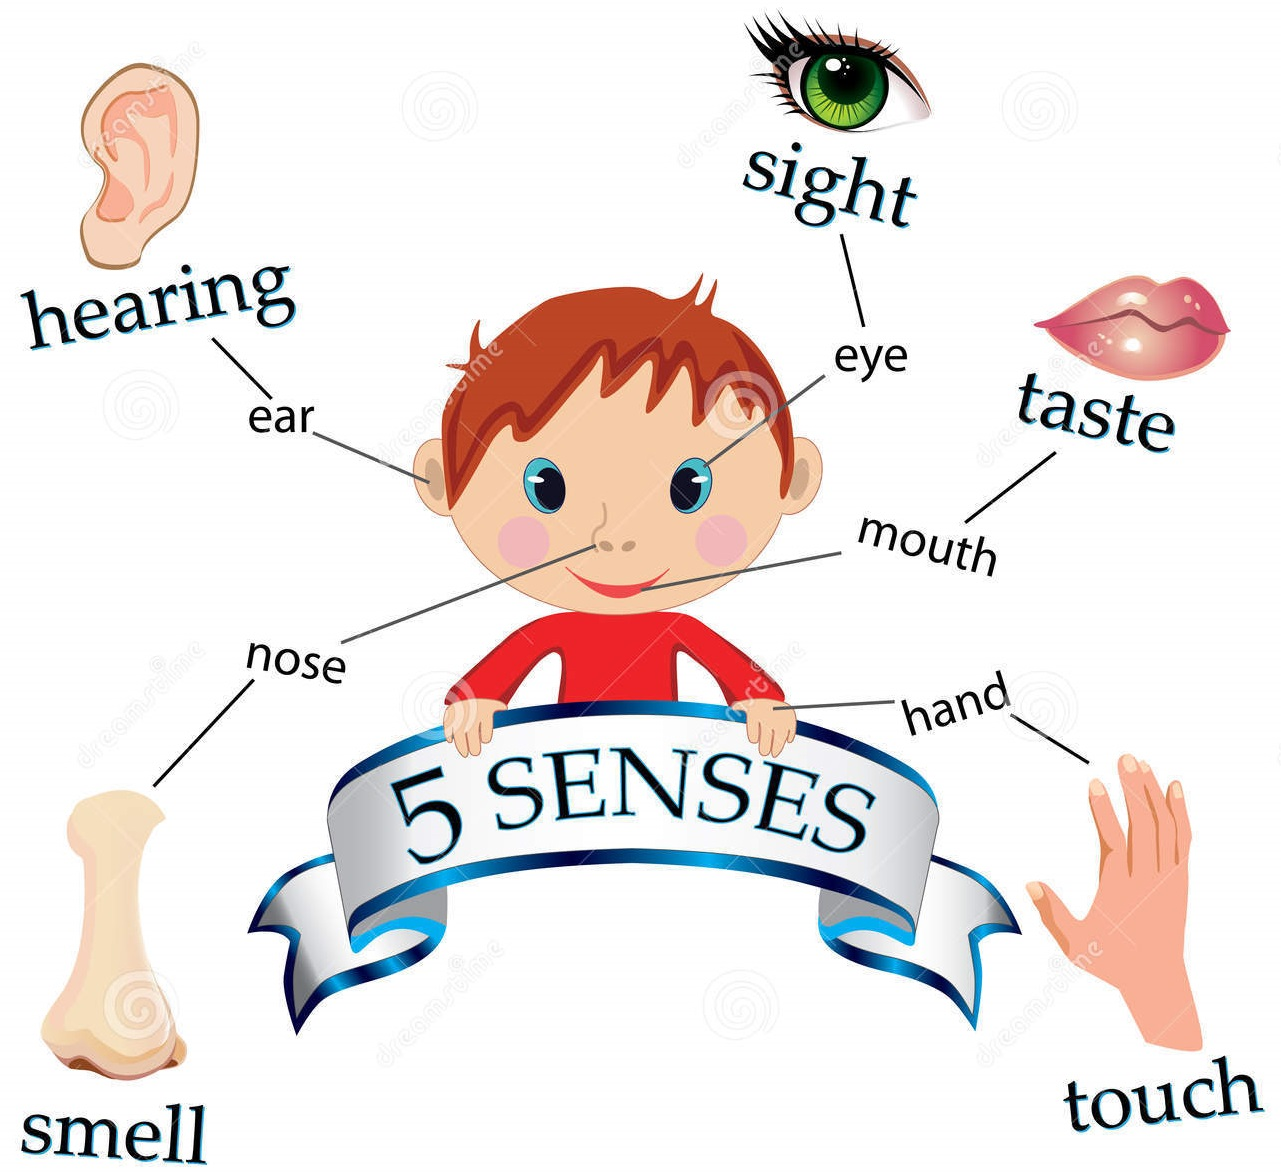 5 Senses Poem Worksheet